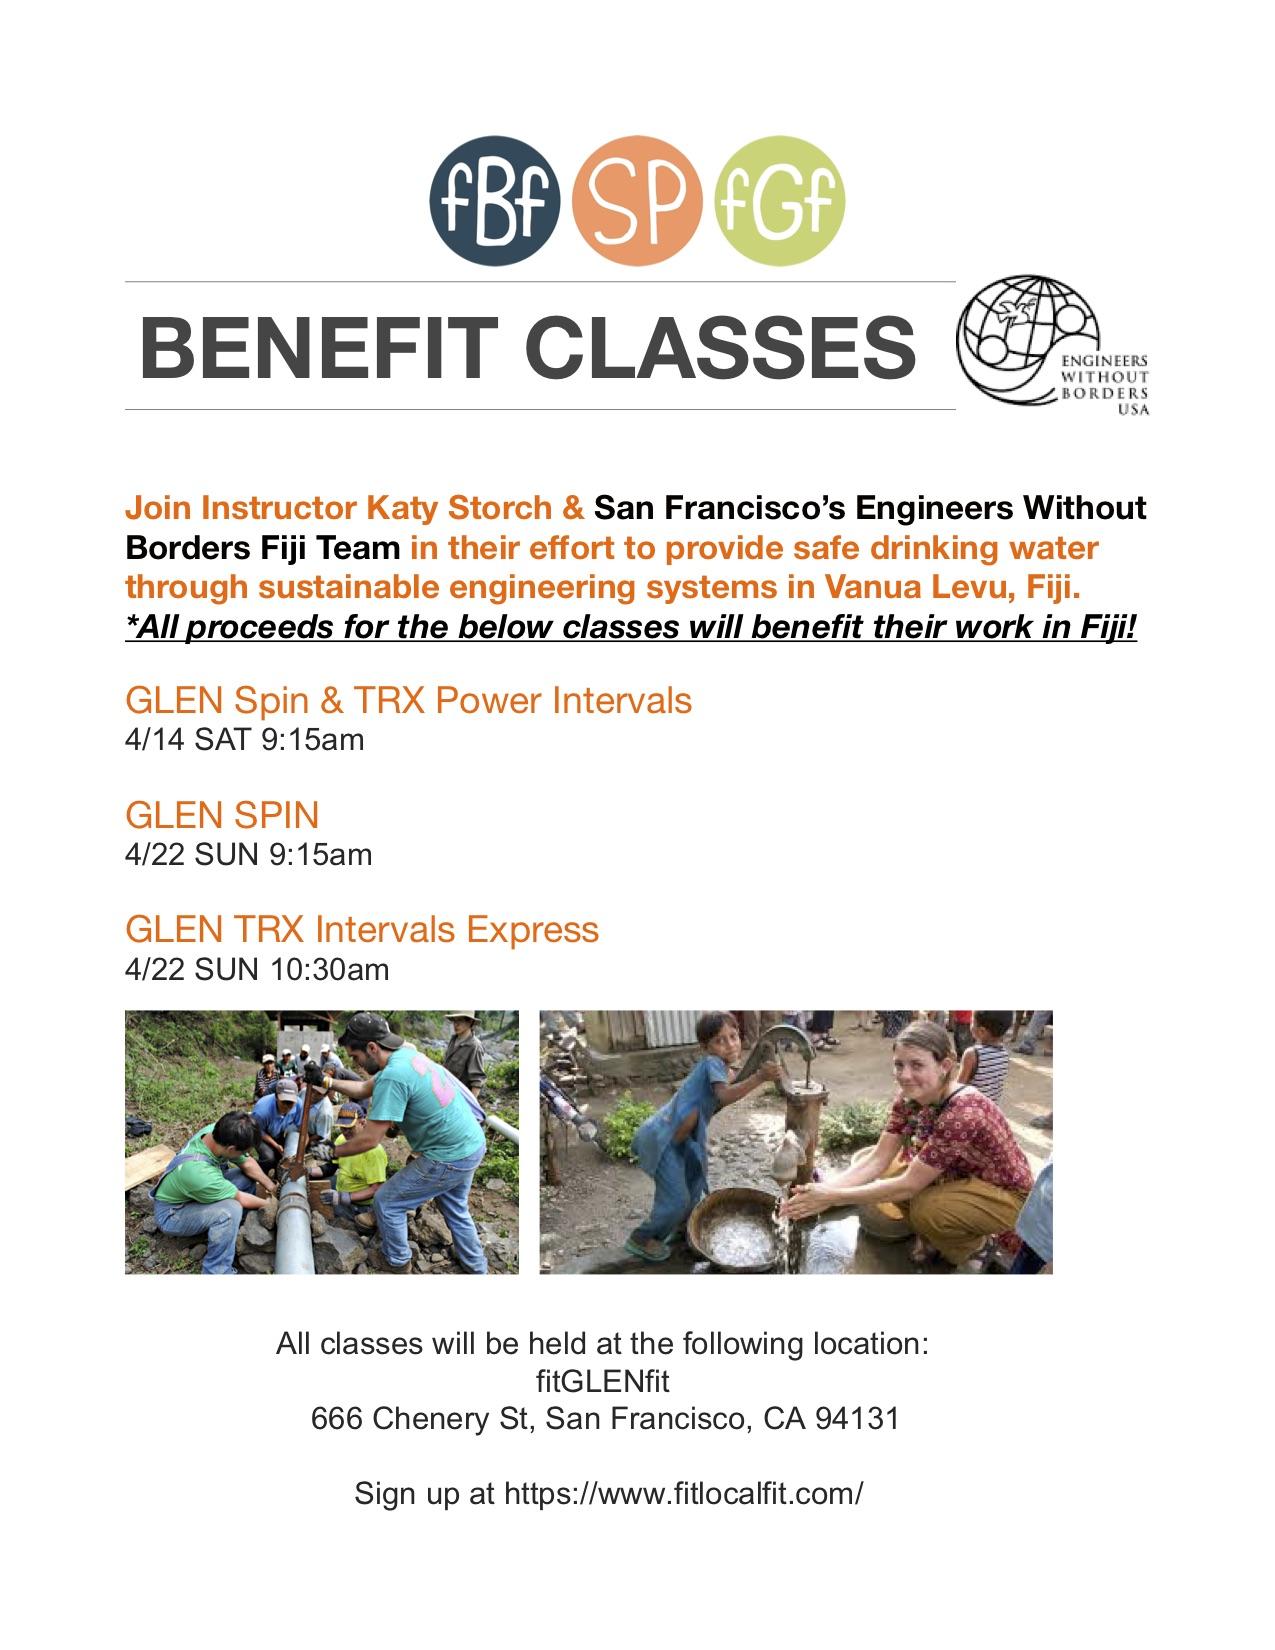 benefit_classes_4.6.18.jpg